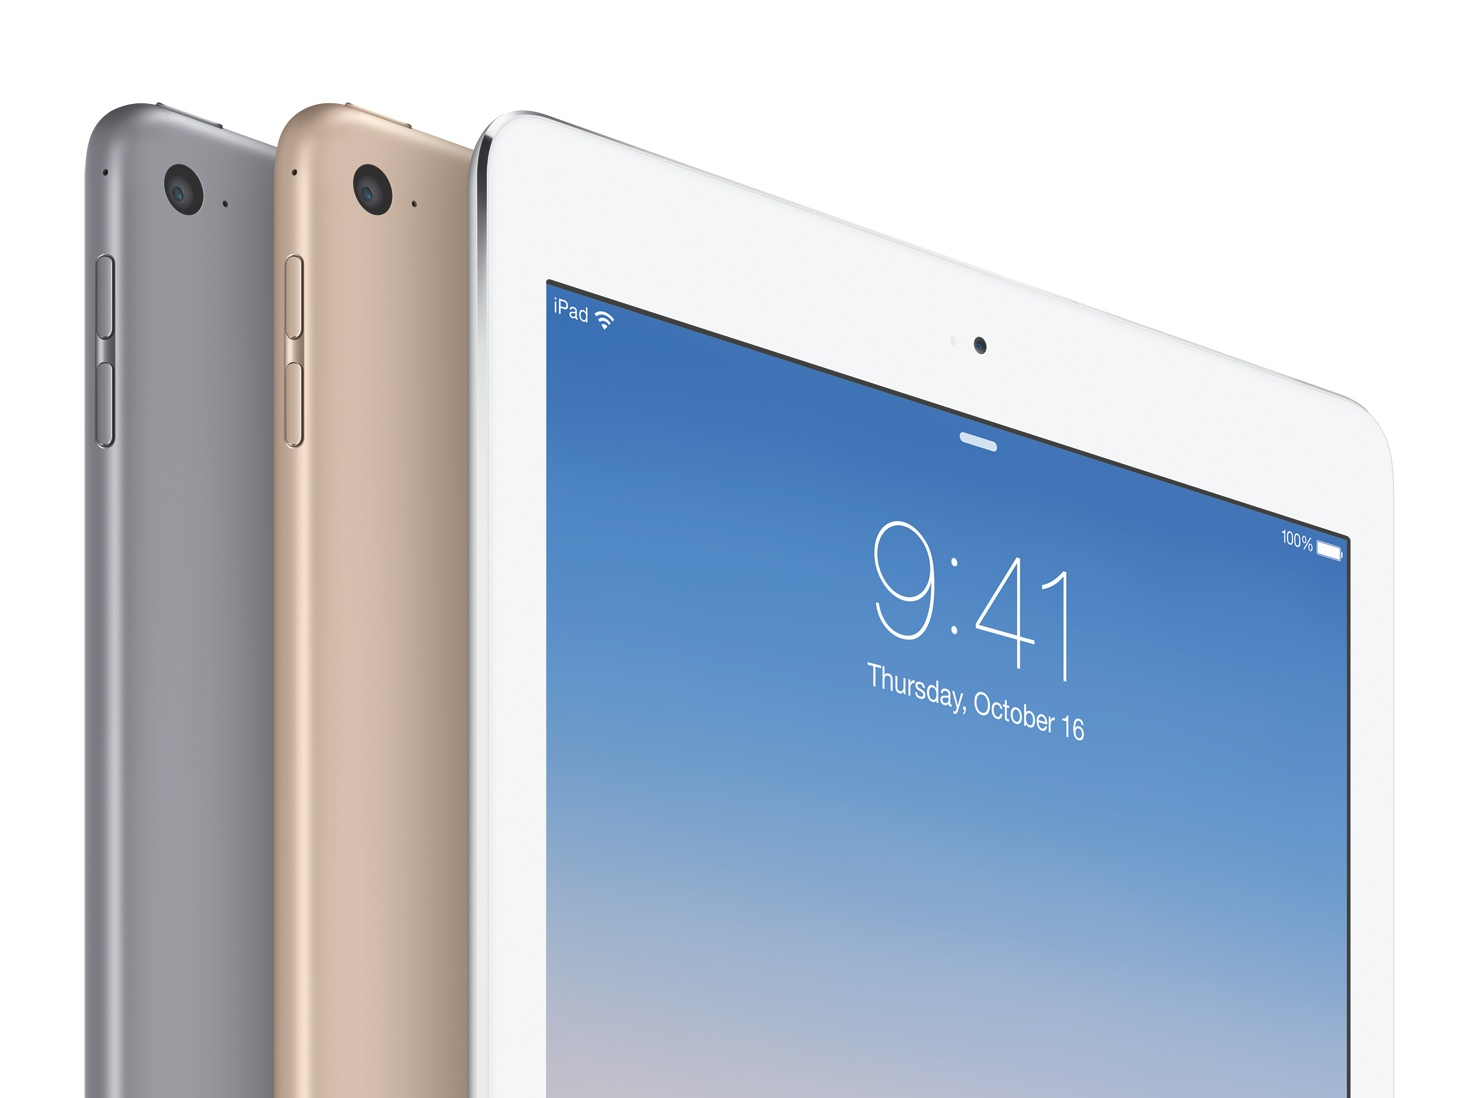 iPad-Air-2-Lock-screen-Silver-Gold-Space-Gray-001